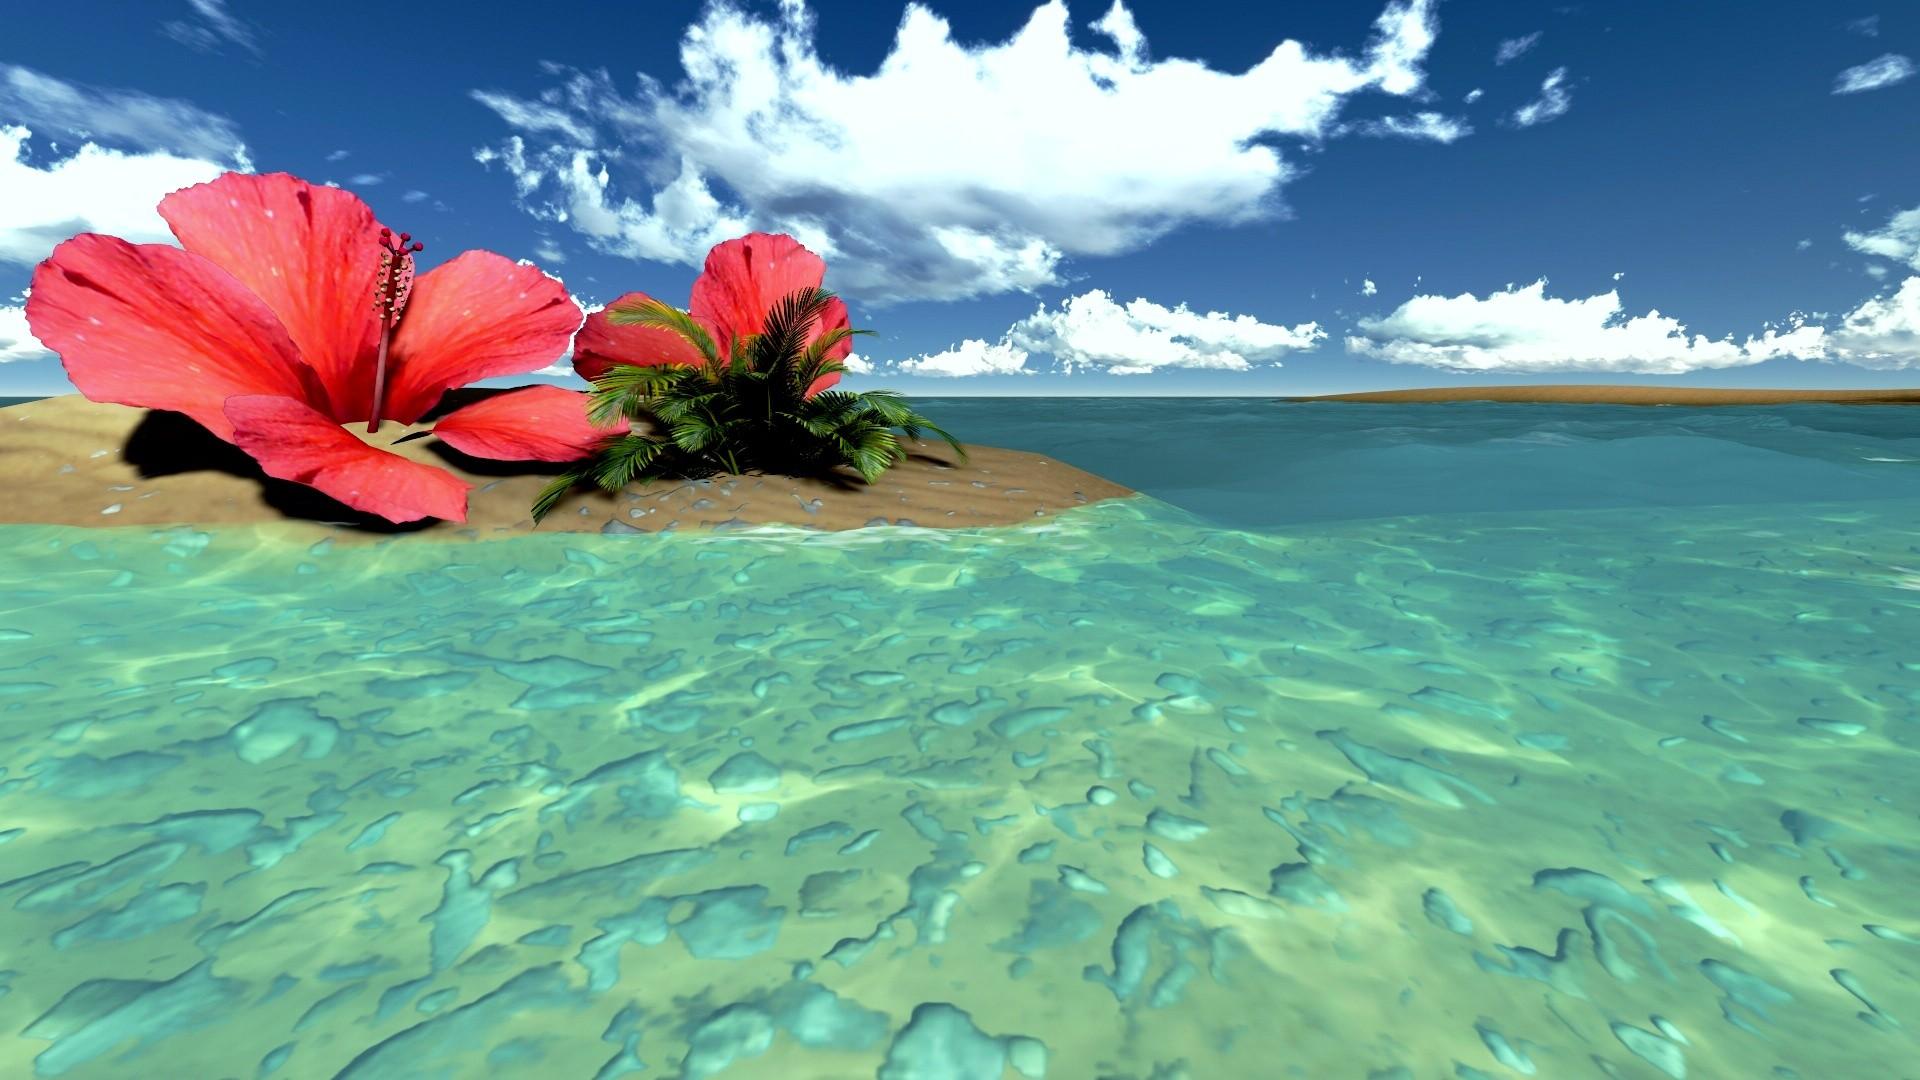 Hd Tropical Island Beach Paradise Wallpapers And Backgrounds: Tropical Wallpaper Backgrounds ·① WallpaperTag